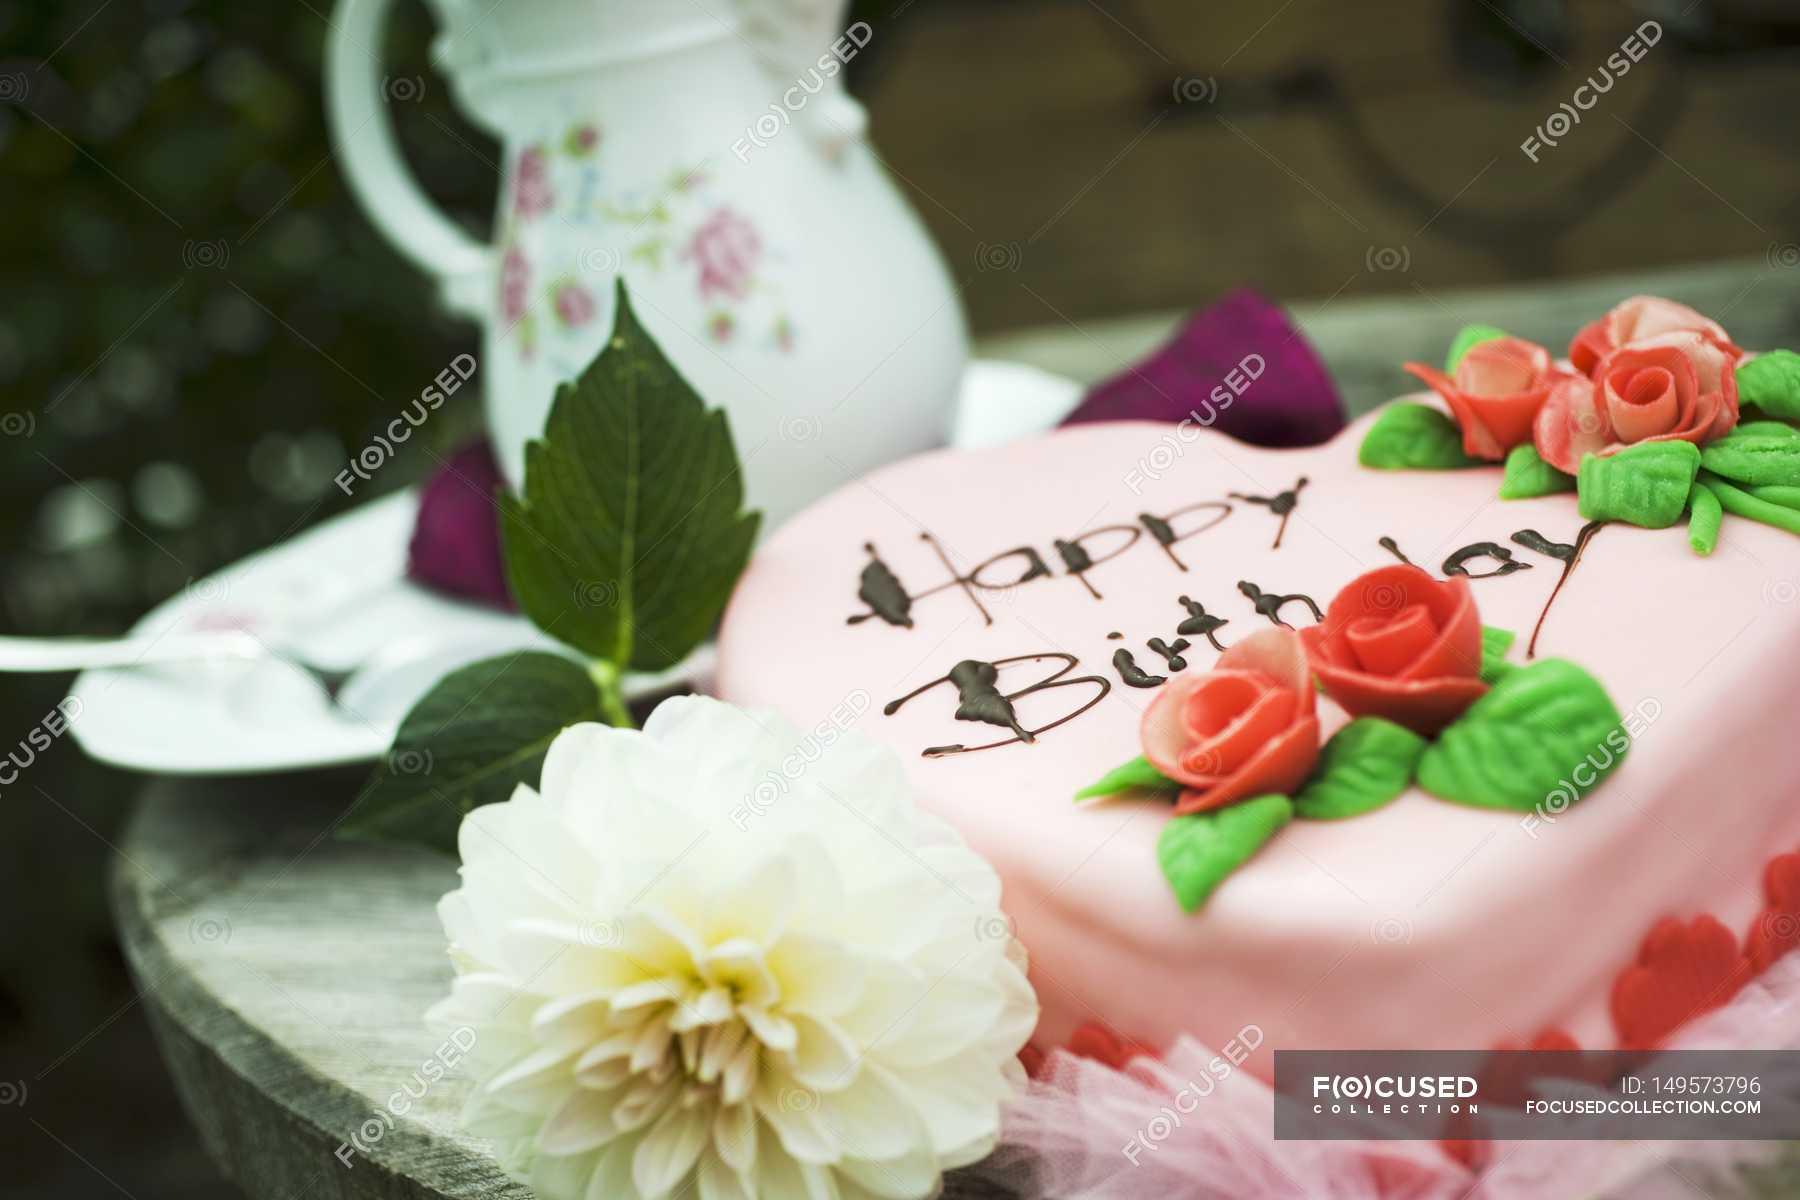 Pink Heart Shaped Birthday Cake Stock Photo 149573796